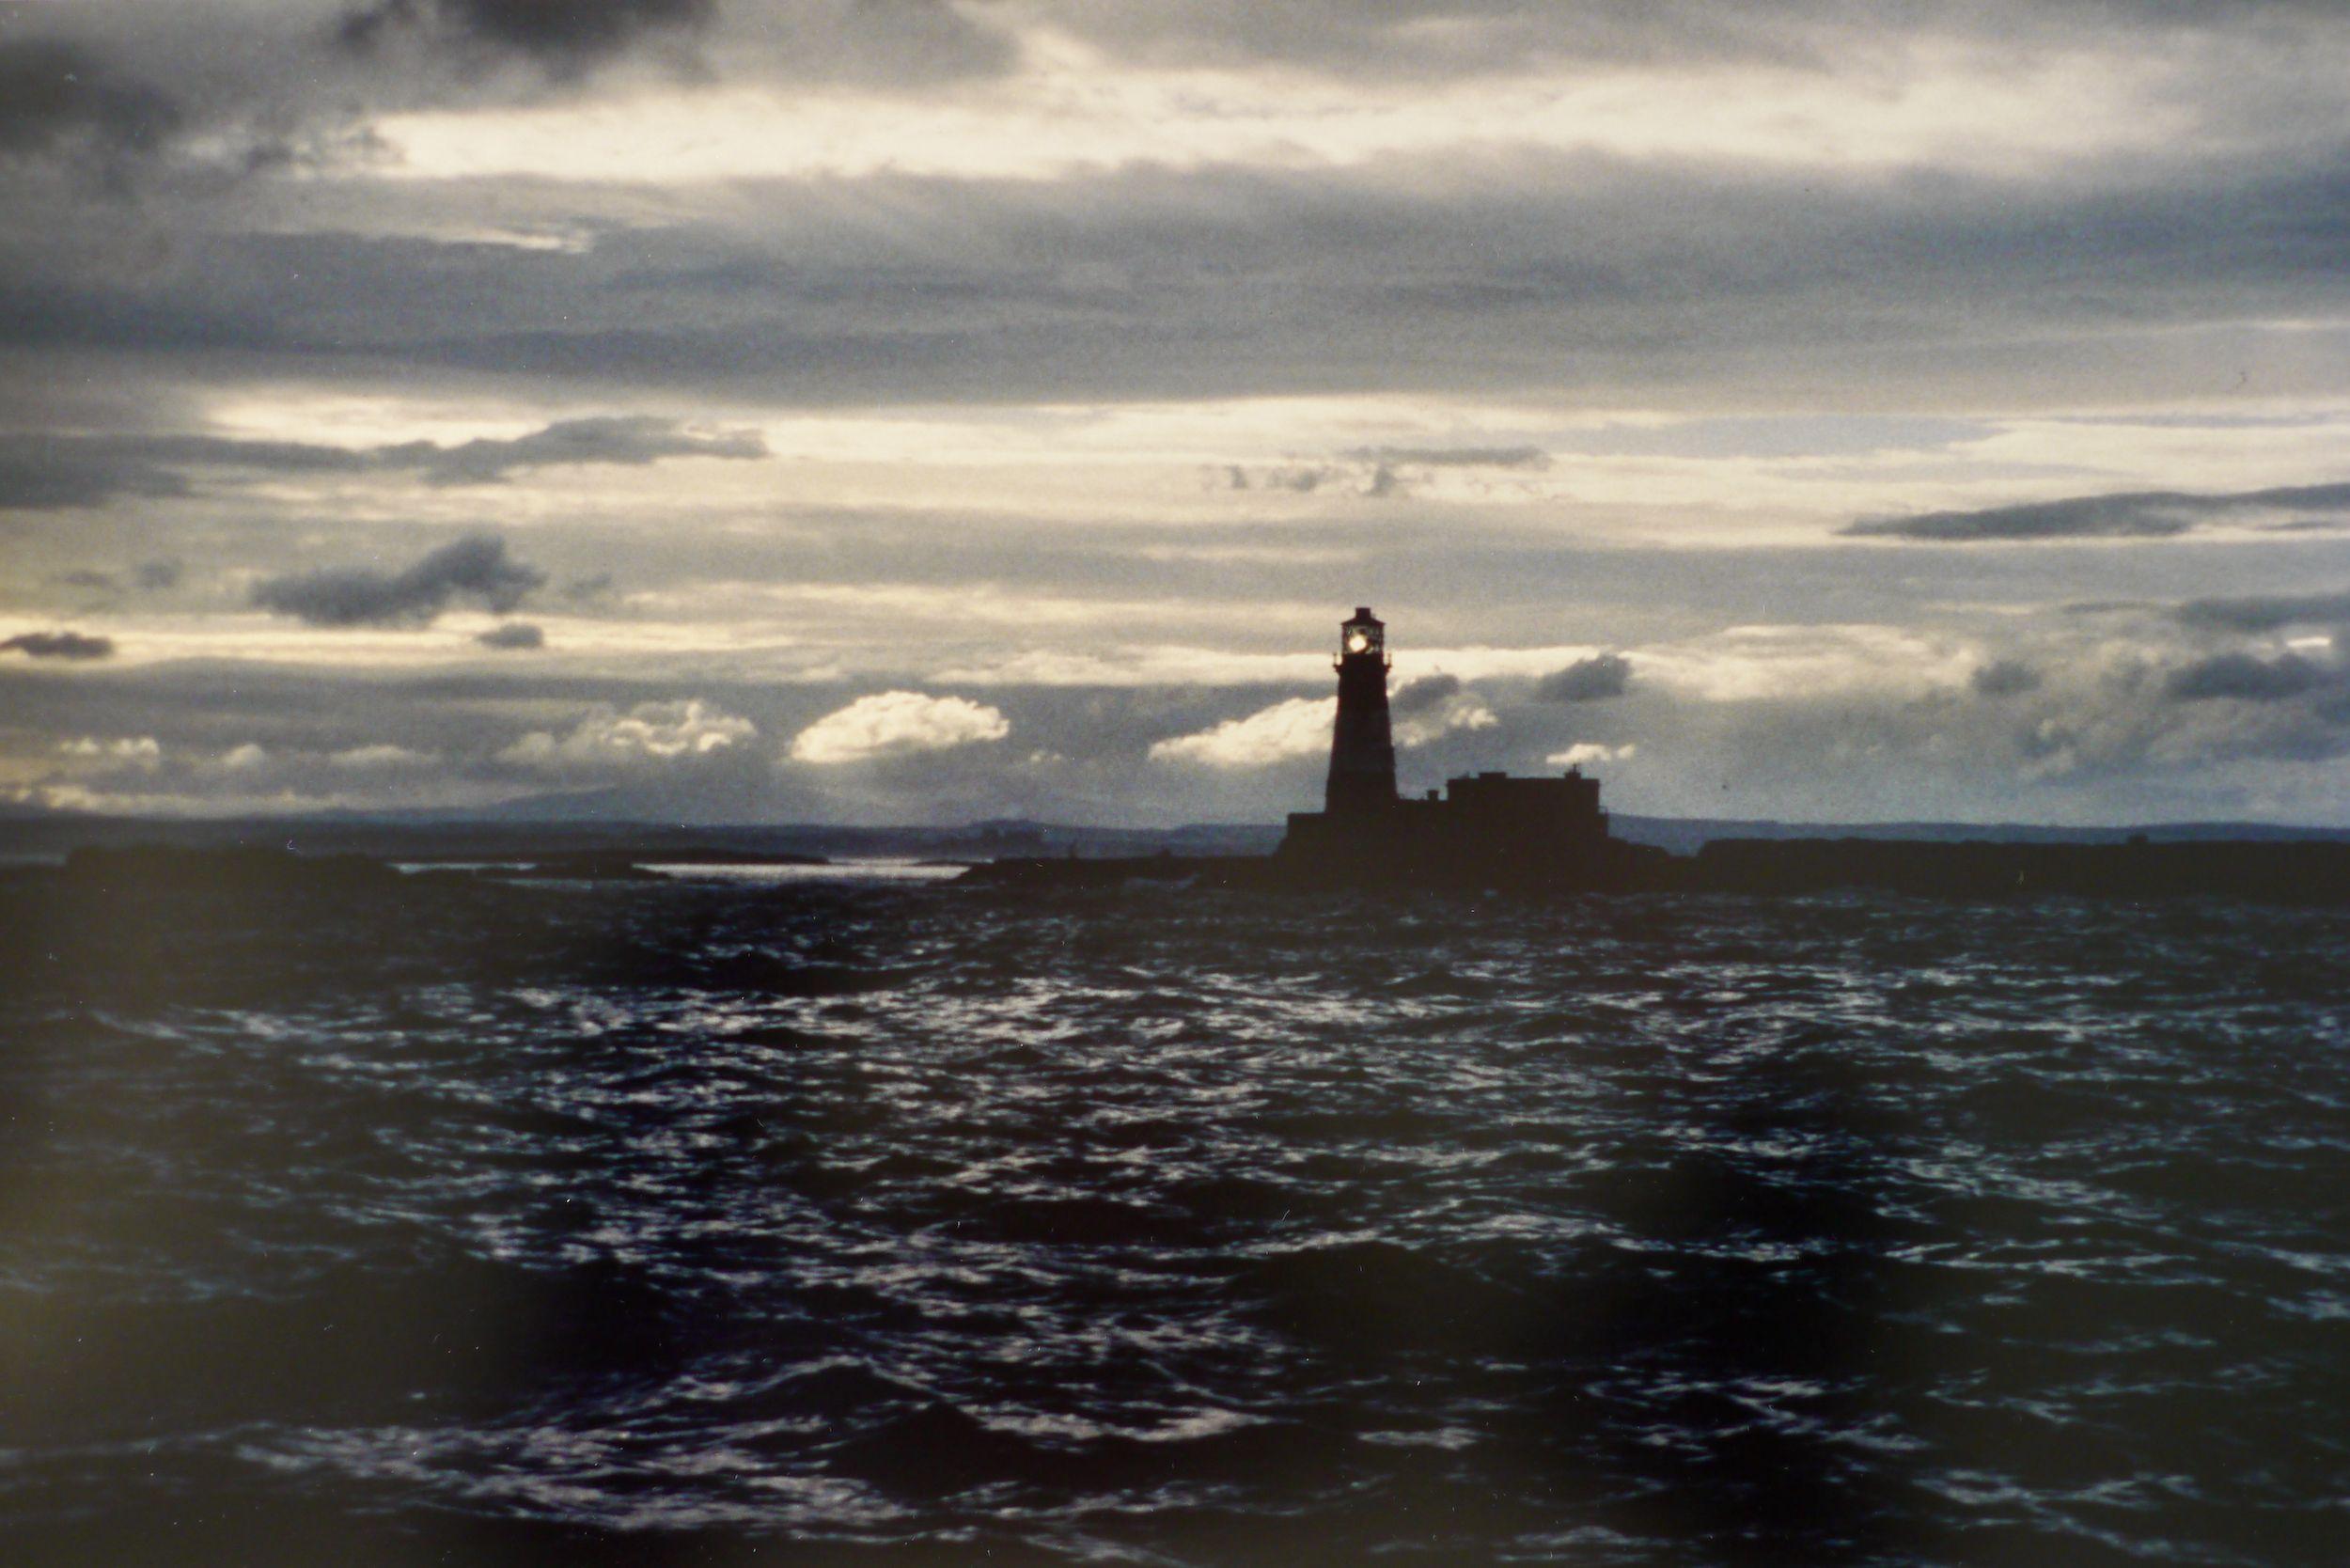 Tacita Dean (b.1965) Longstone Lighthouse, 1996, analogue photograph, 35 x 53 cm.